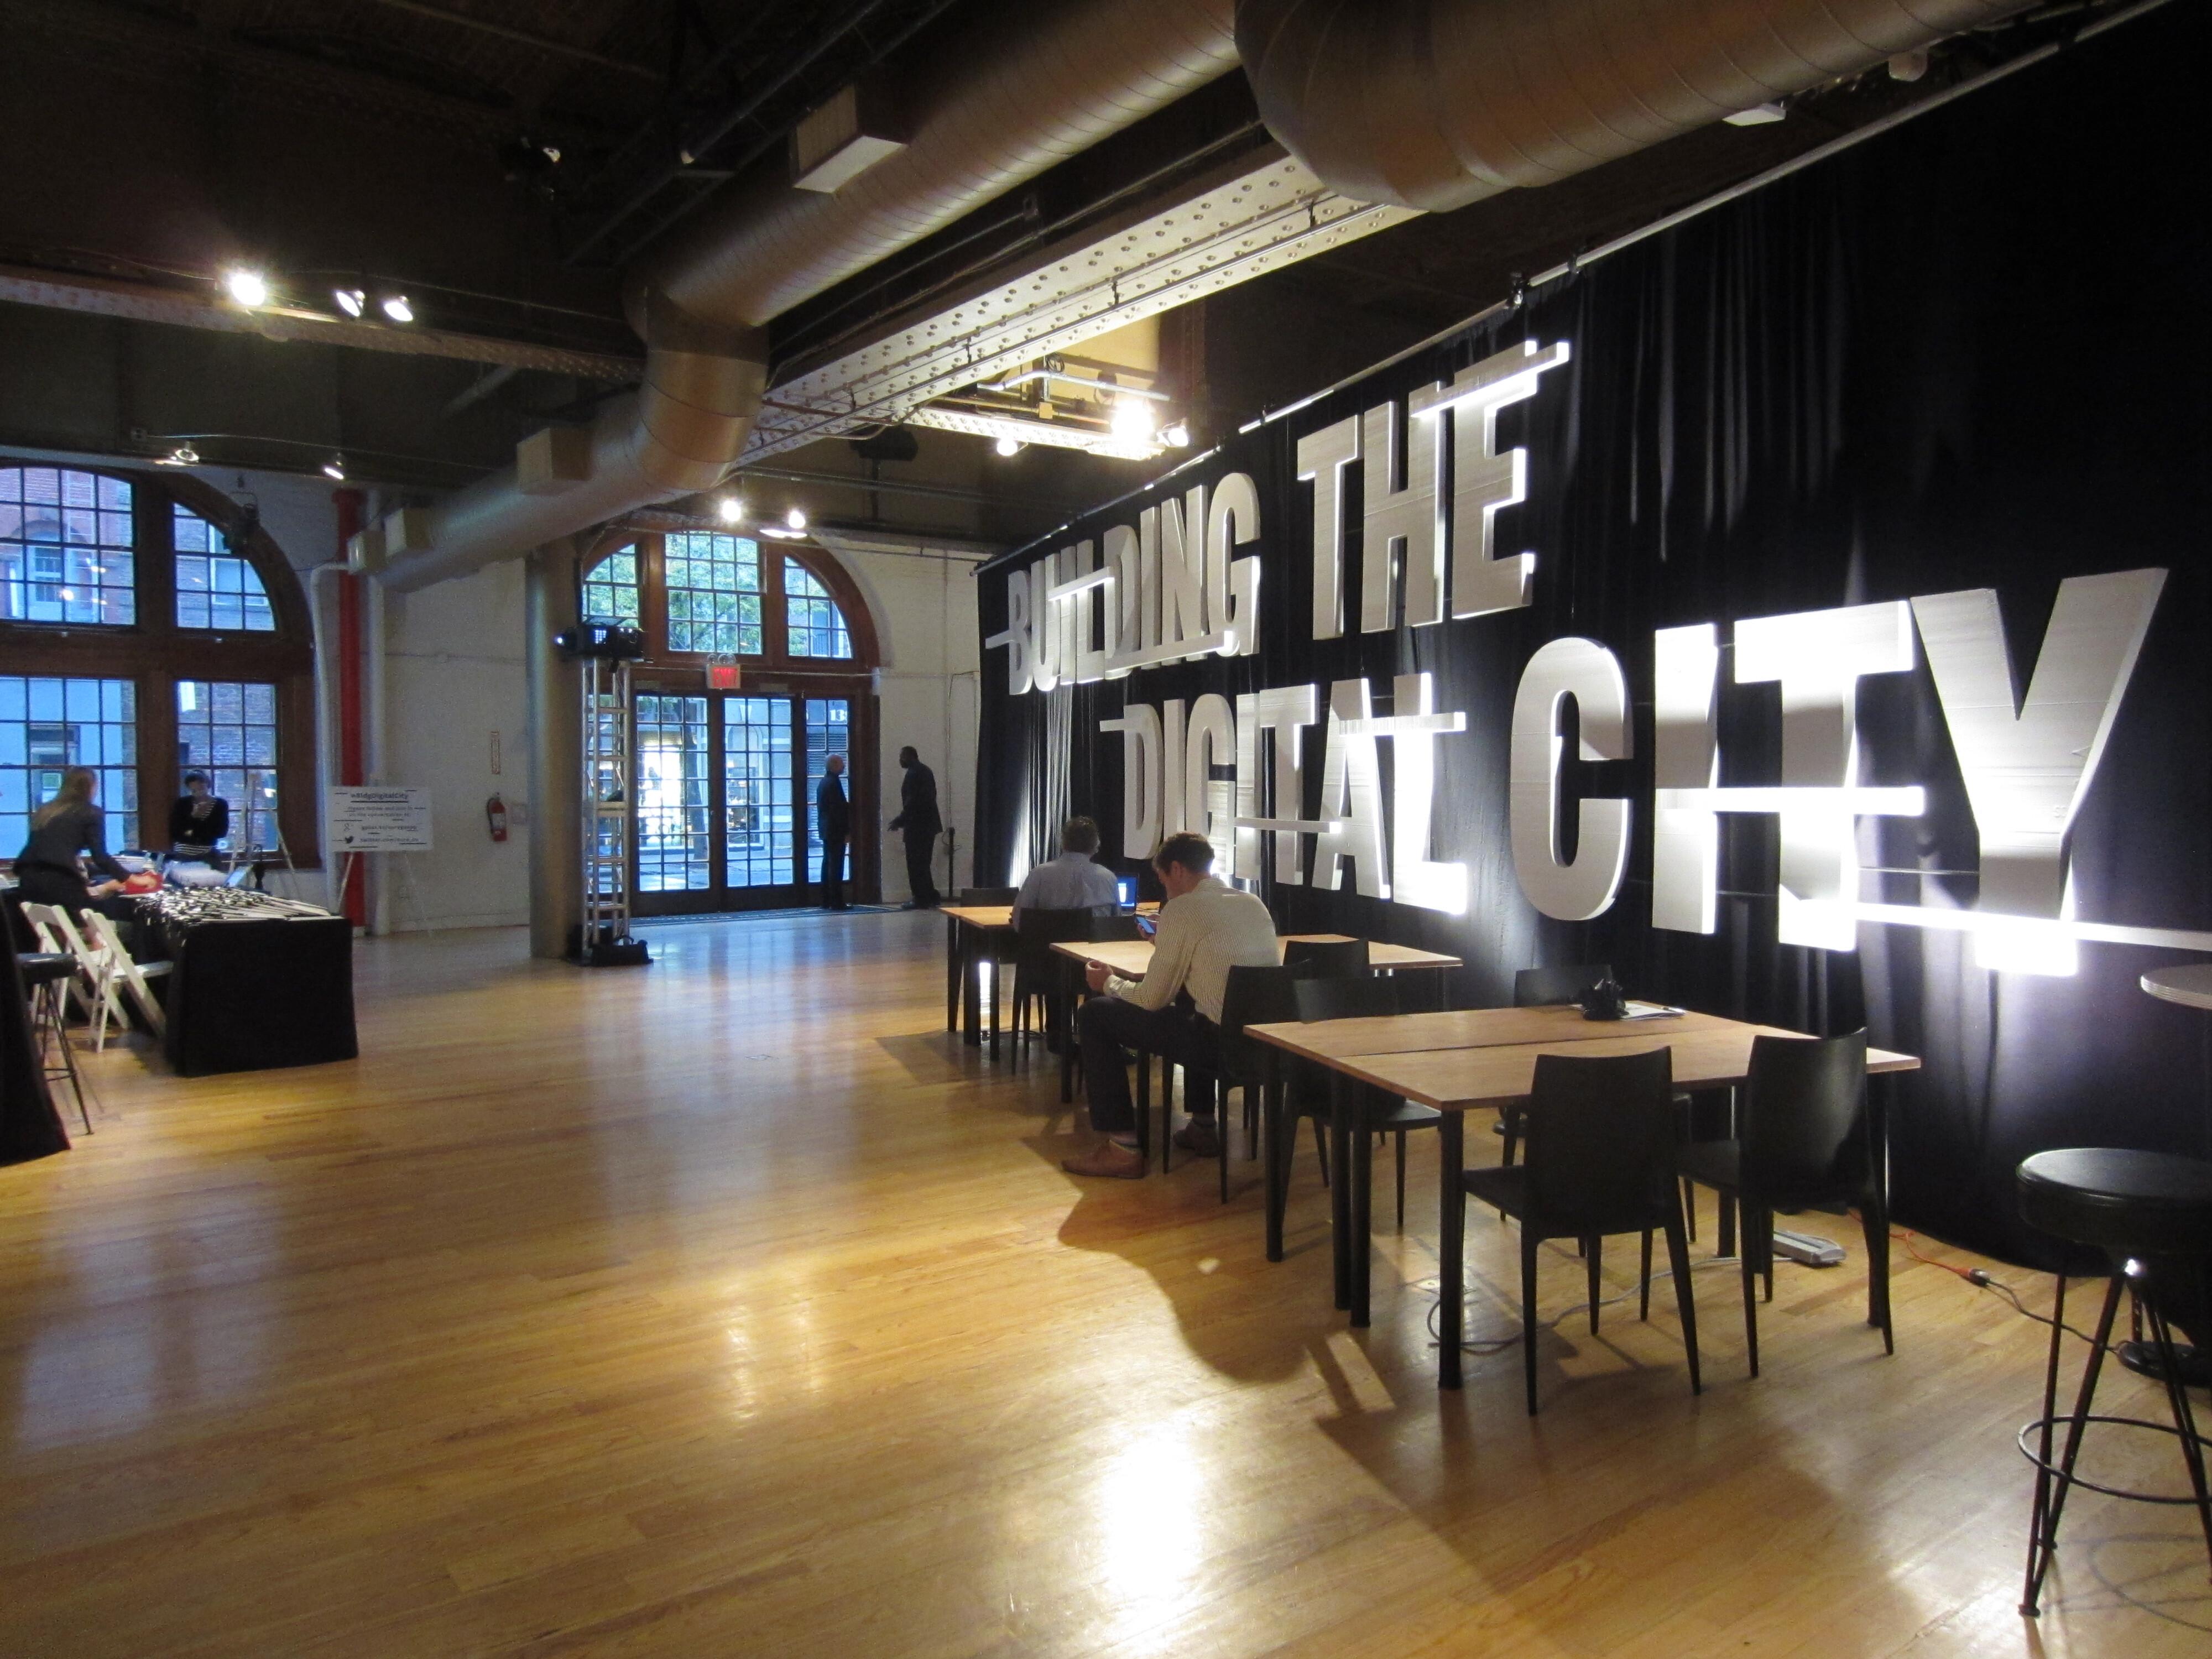 Building the Digital City